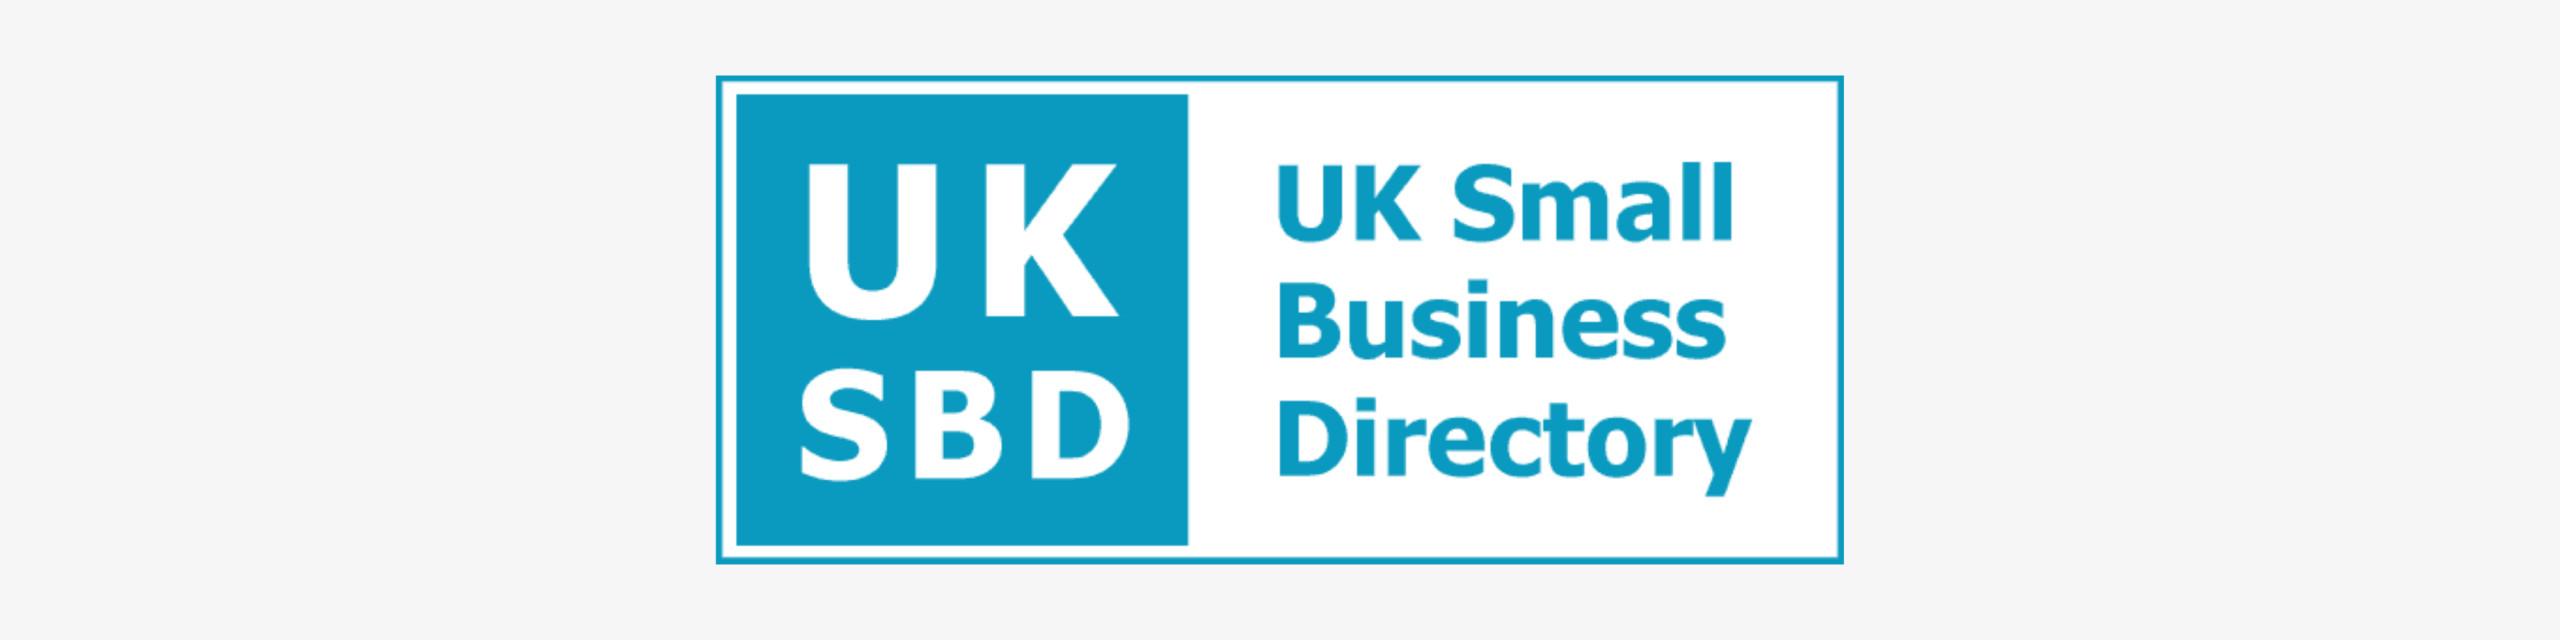 https://www.uksmallbusinessdirectory.co.uk/listing/227635/